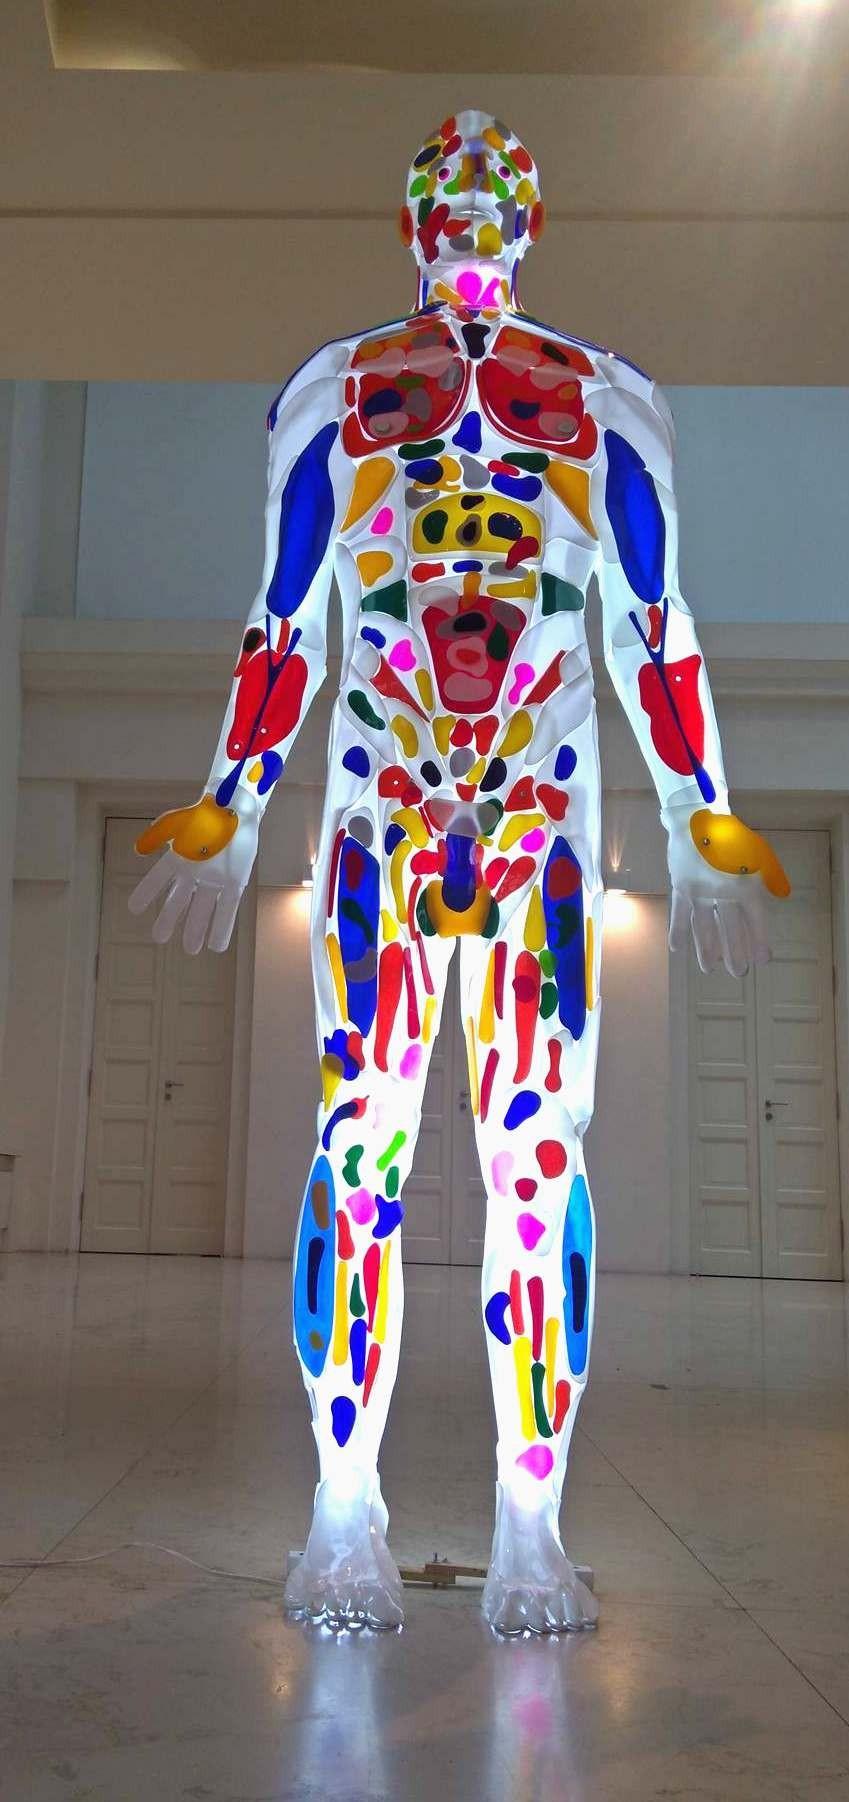 Enlightened man is a light sculpture made from Plexiglas